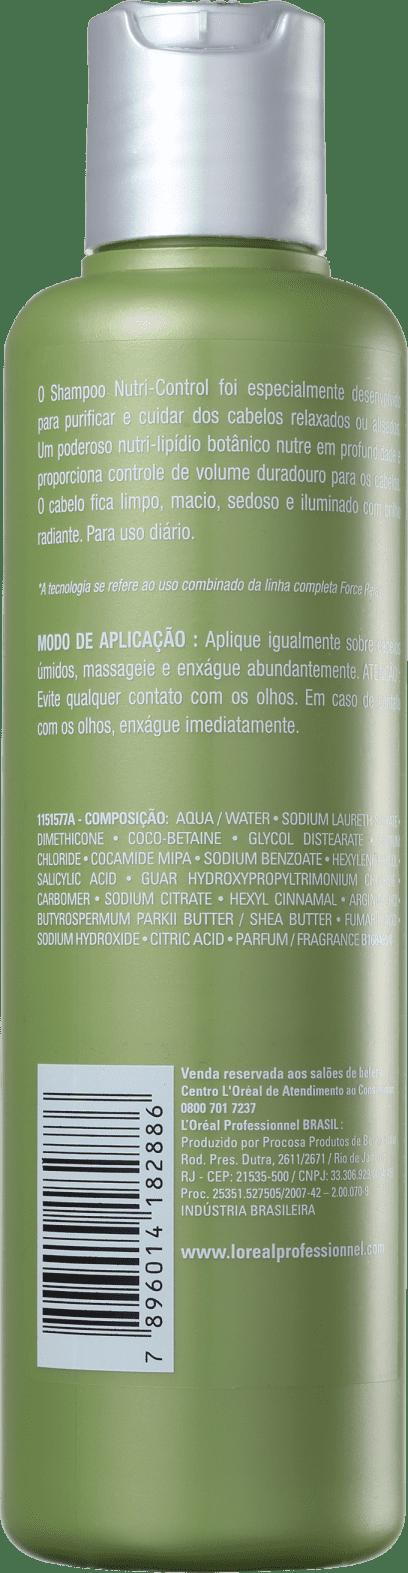 07cb89512 L'Oréal Professionnel Expert Force Relax Nutri-Control - Shampoo 300ml